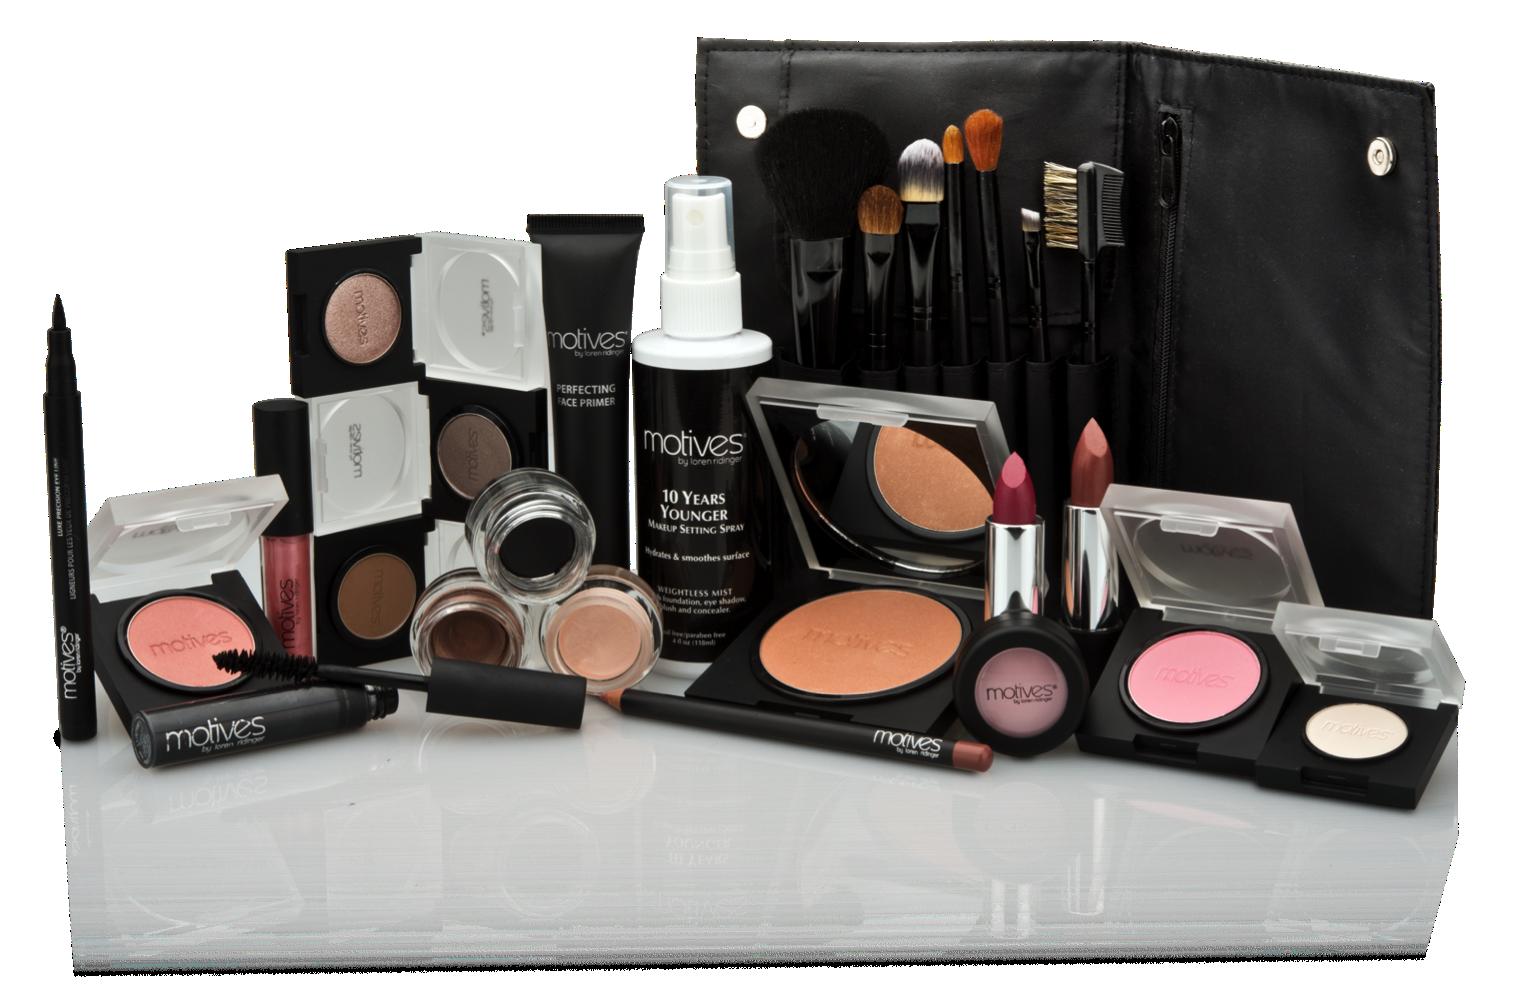 how to become a representative for a makeup company